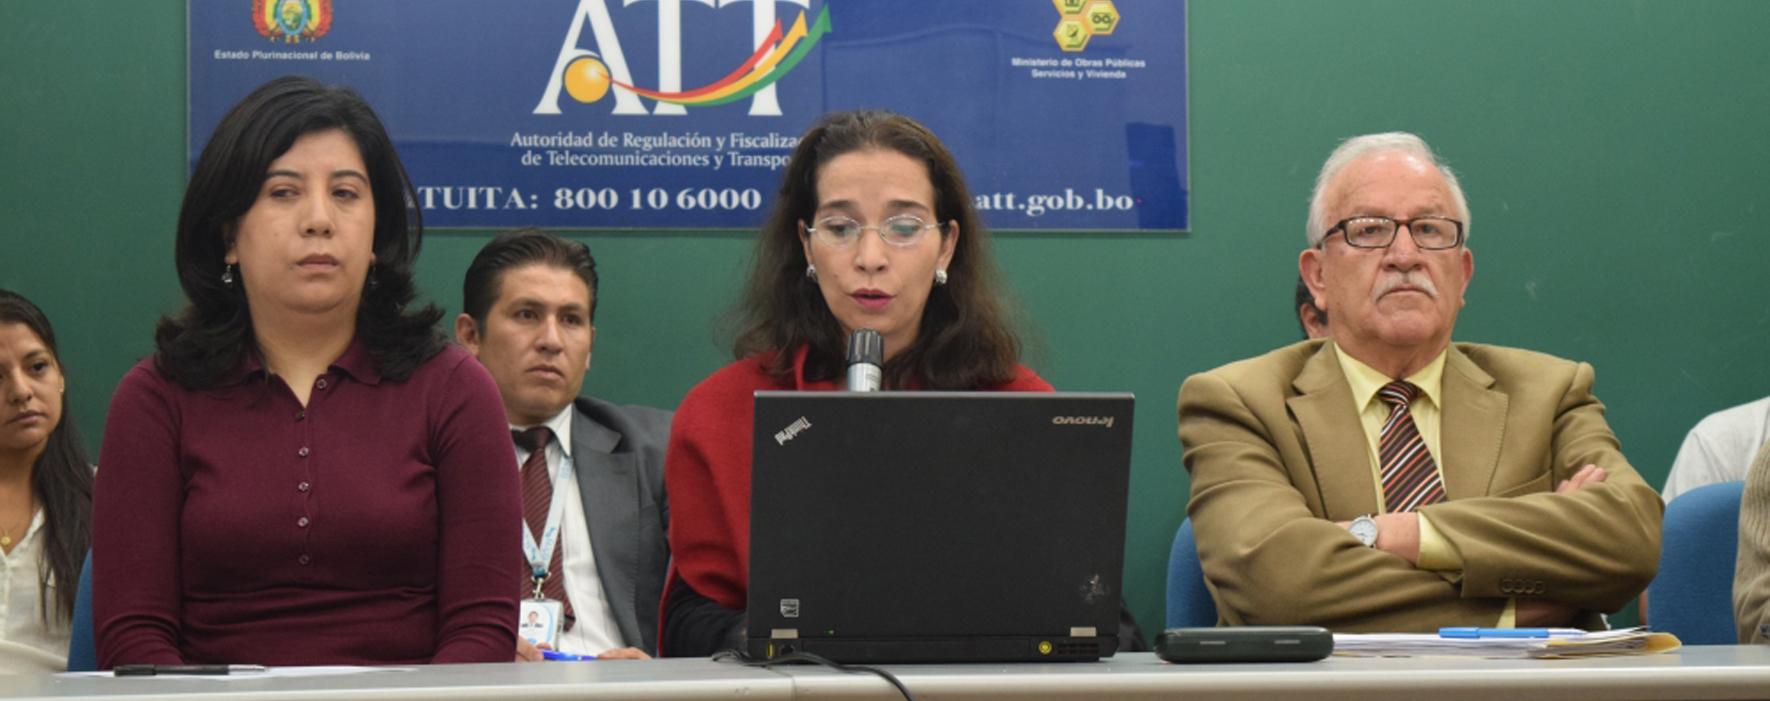 Reunión de Aclaración - Presidenta de la Comisión de Calificación: Dra. María Angélica Ruíz